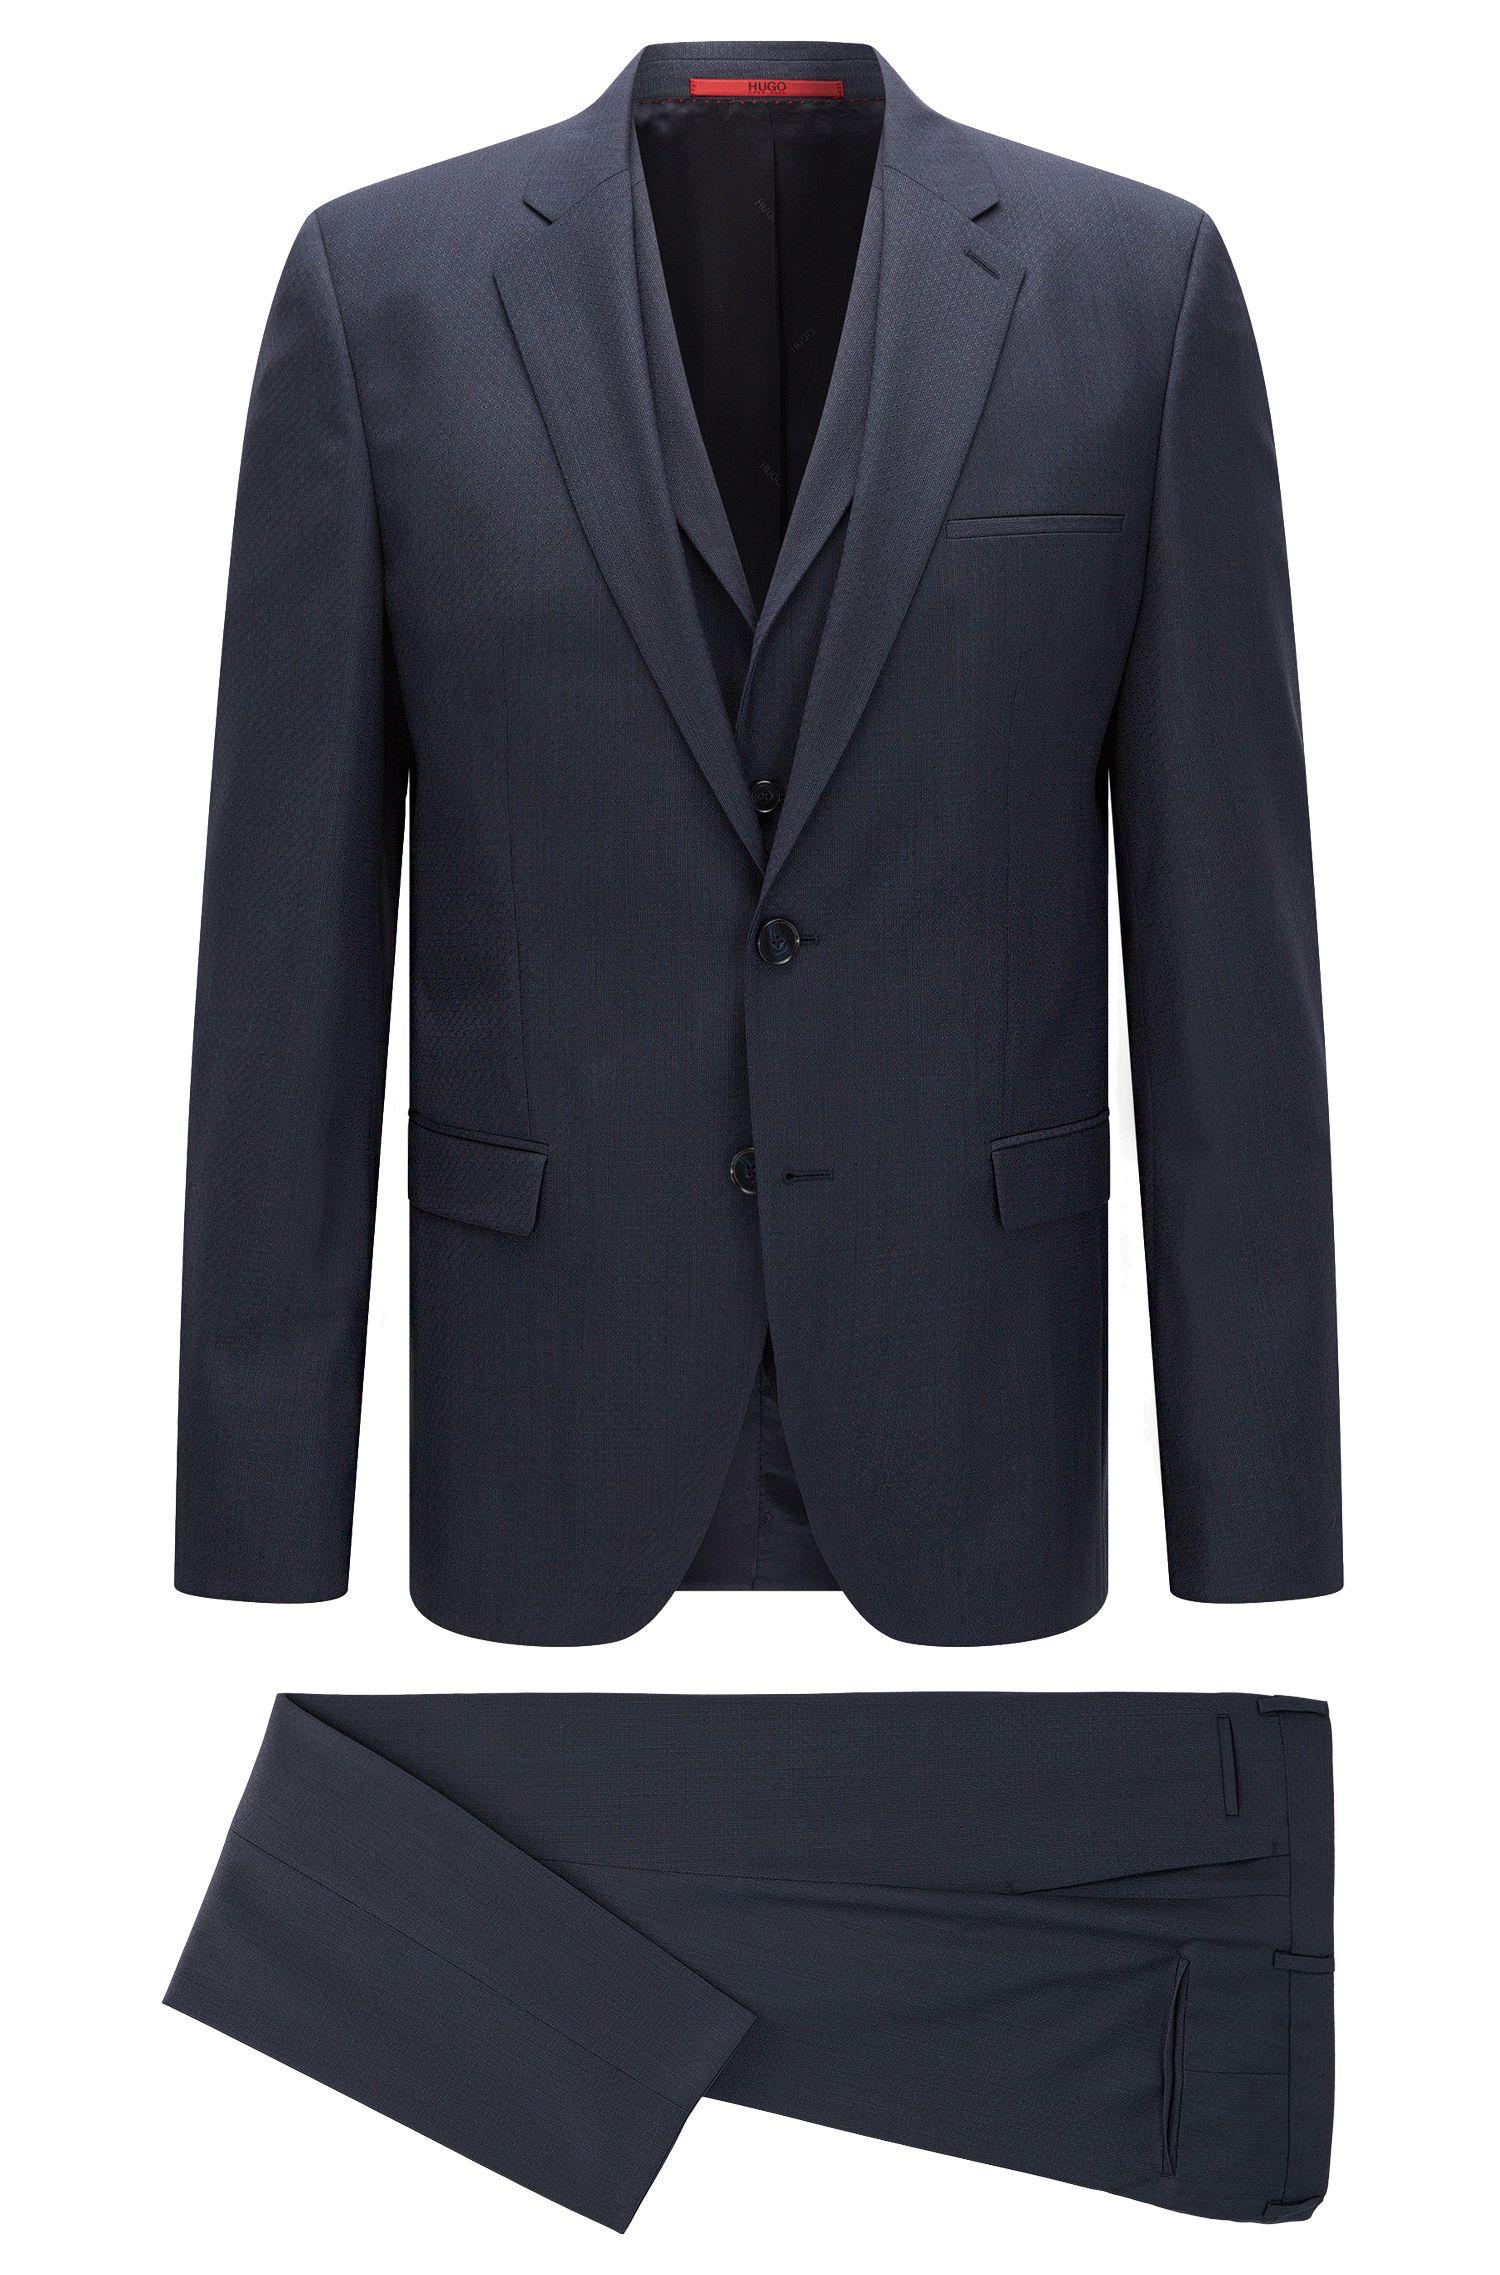 Super 100 Wool 3-Piece Suit, Extra Slim Fit | Adlon/Wandor/Hendrin